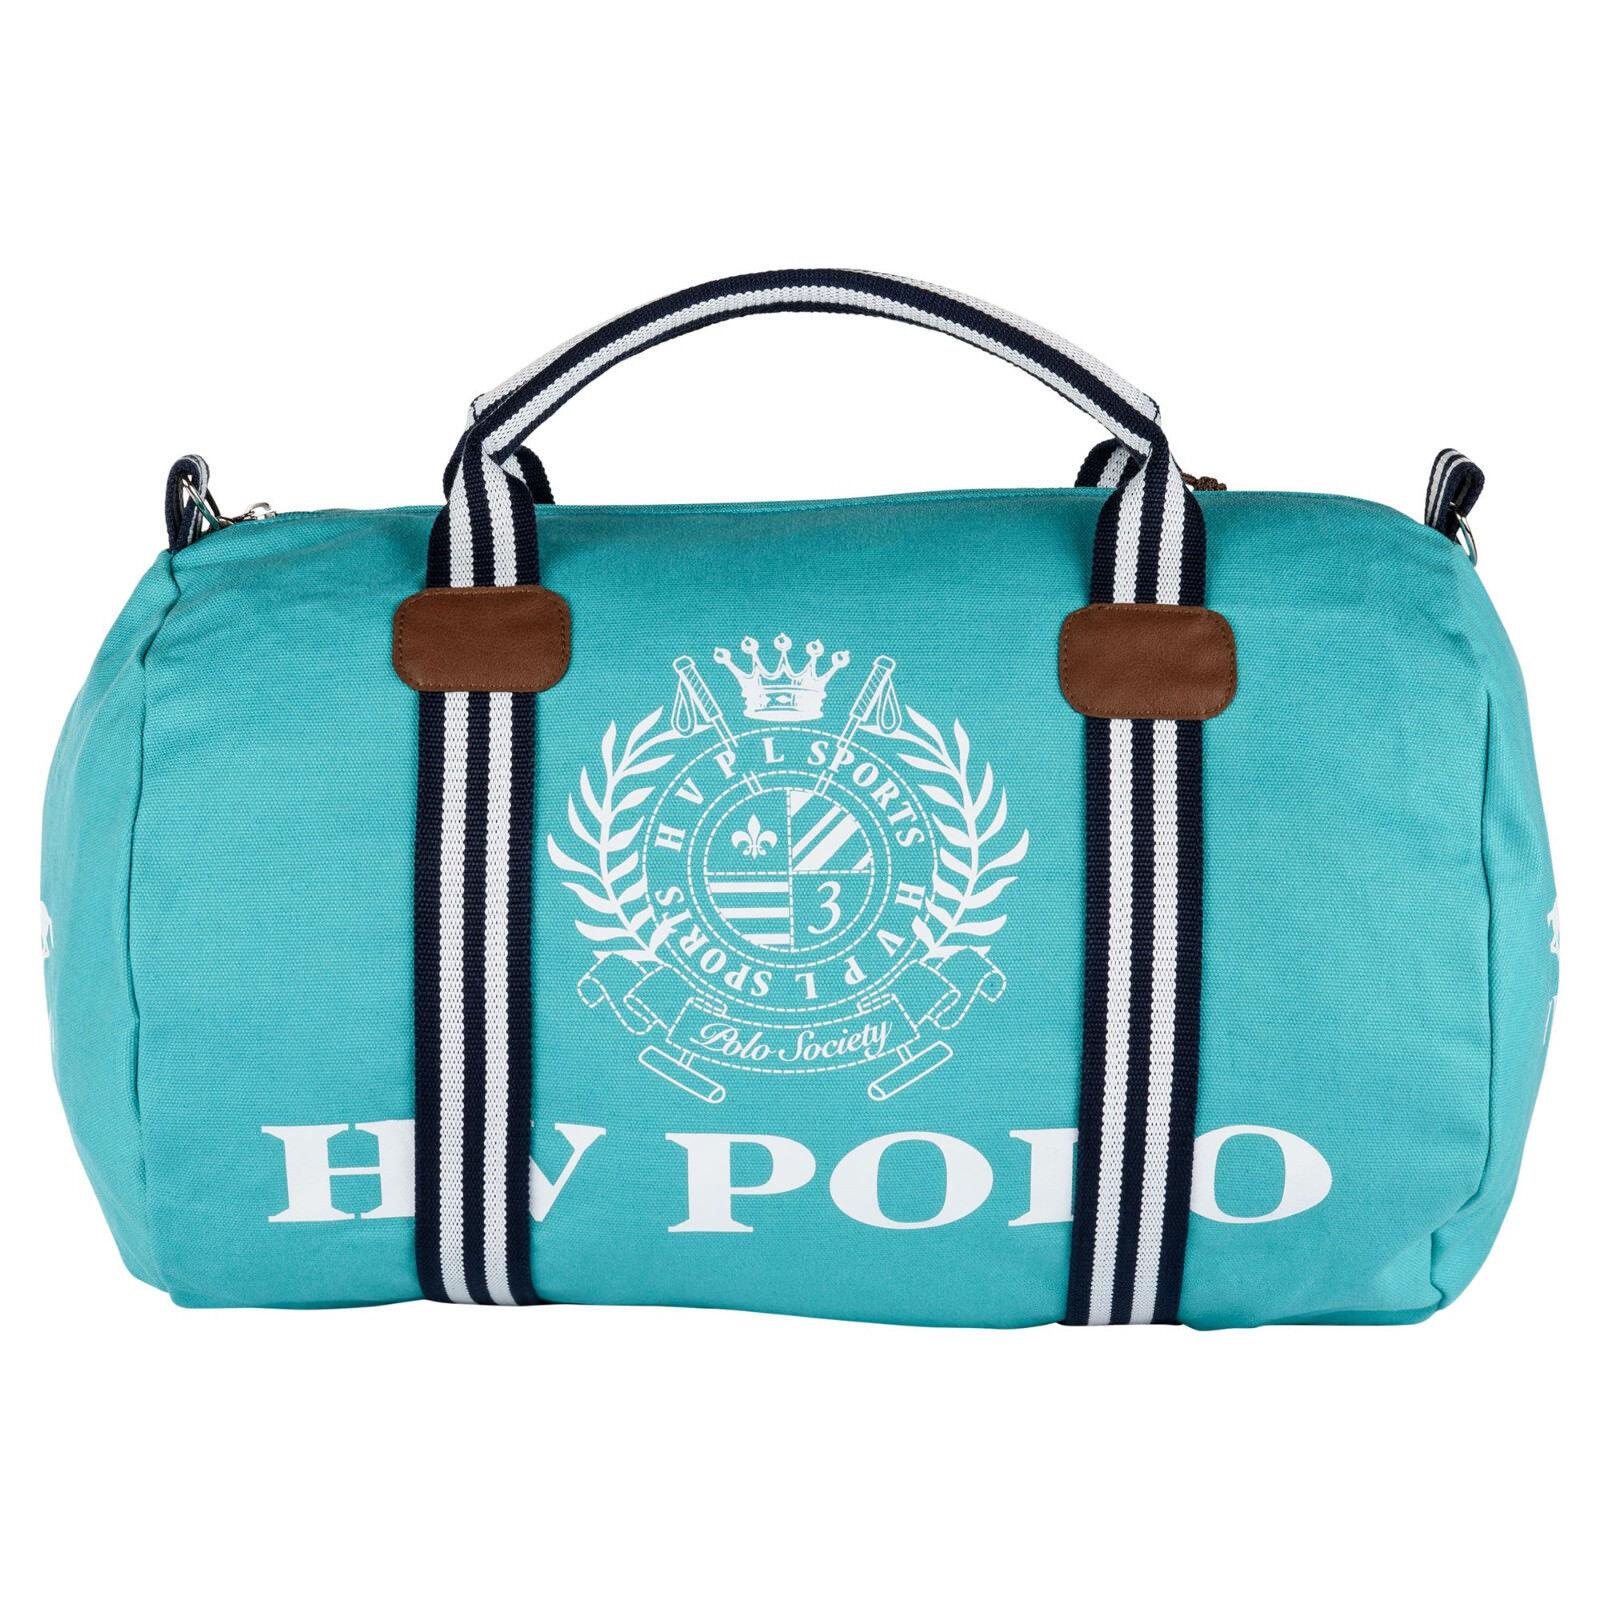 HV POLO Sport Sport Sport Tasche Favouritas Sporttasche 45 cm x 25 cm große Prints und Logo d8d439